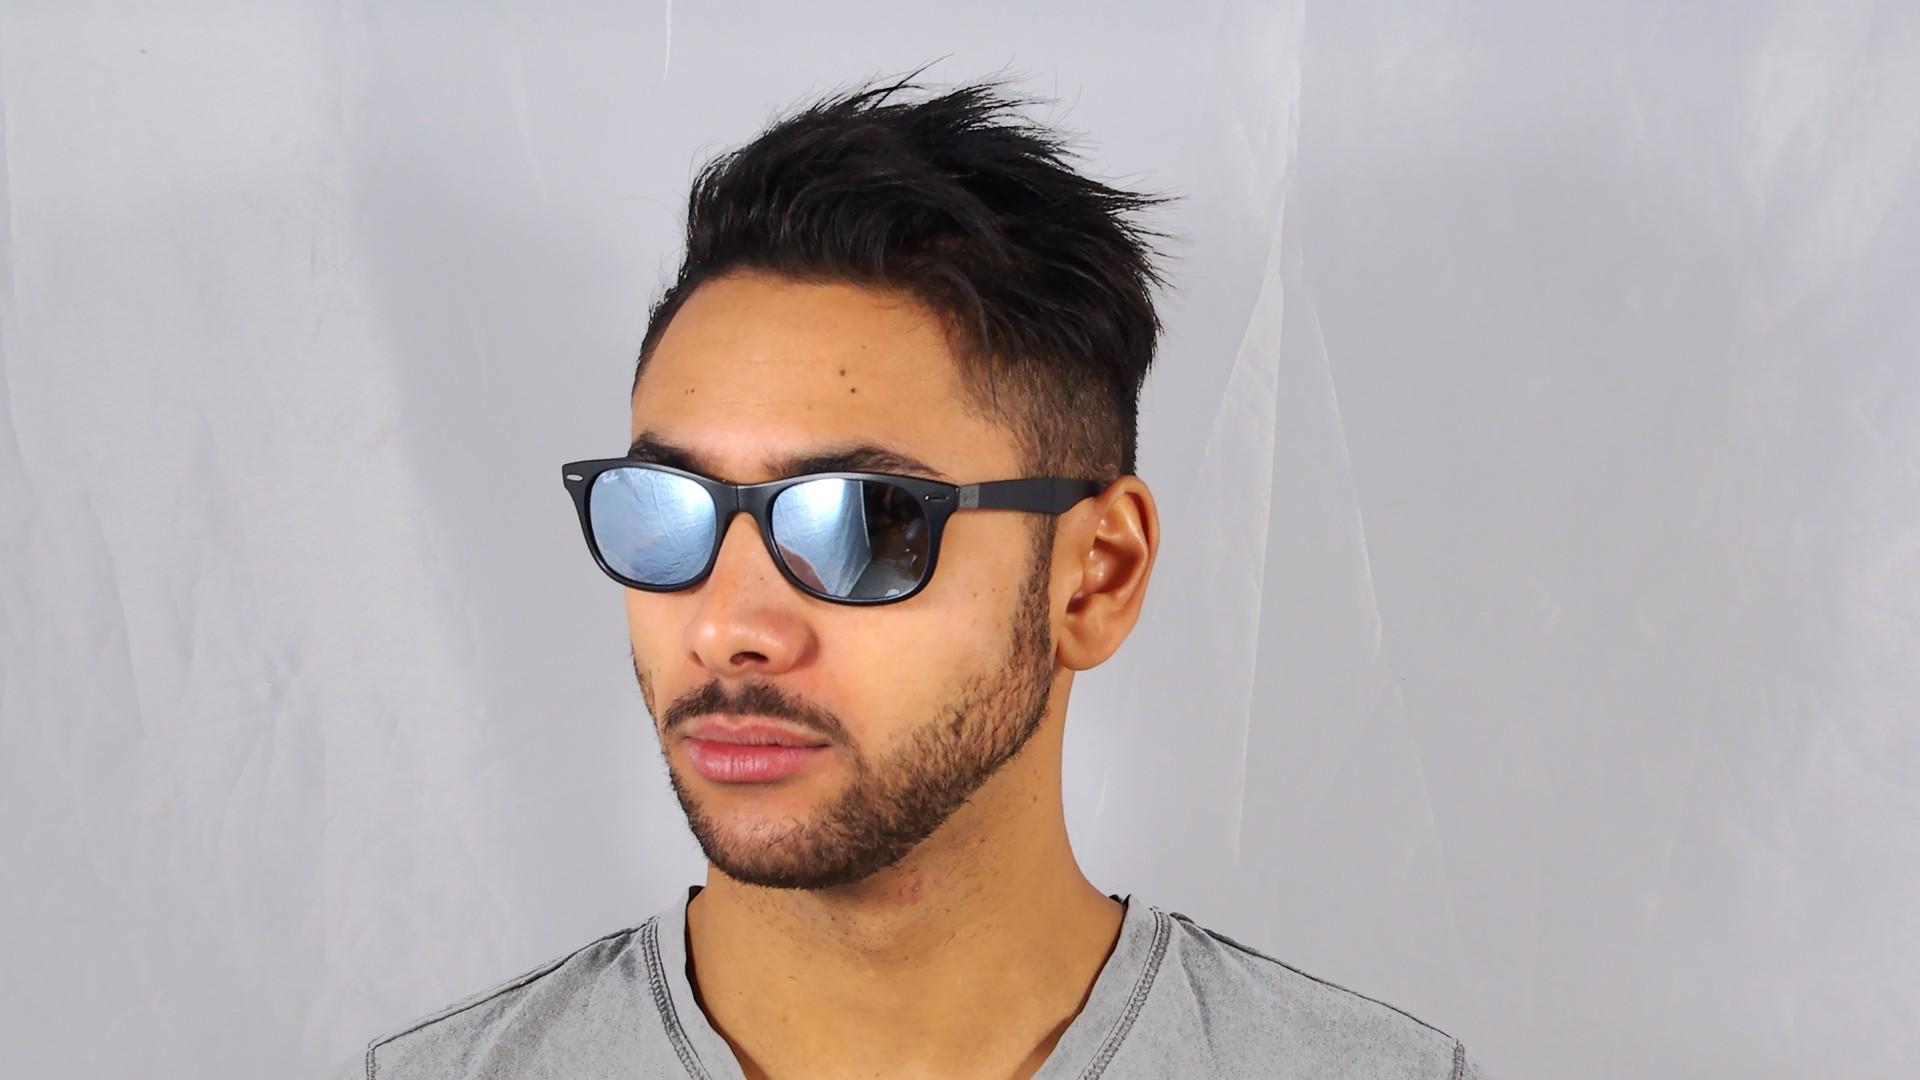 4f208e1572e2e2 Ray-ban cats 5000 rb4125 - noir   gris lunettes de soleil ray-ban ...